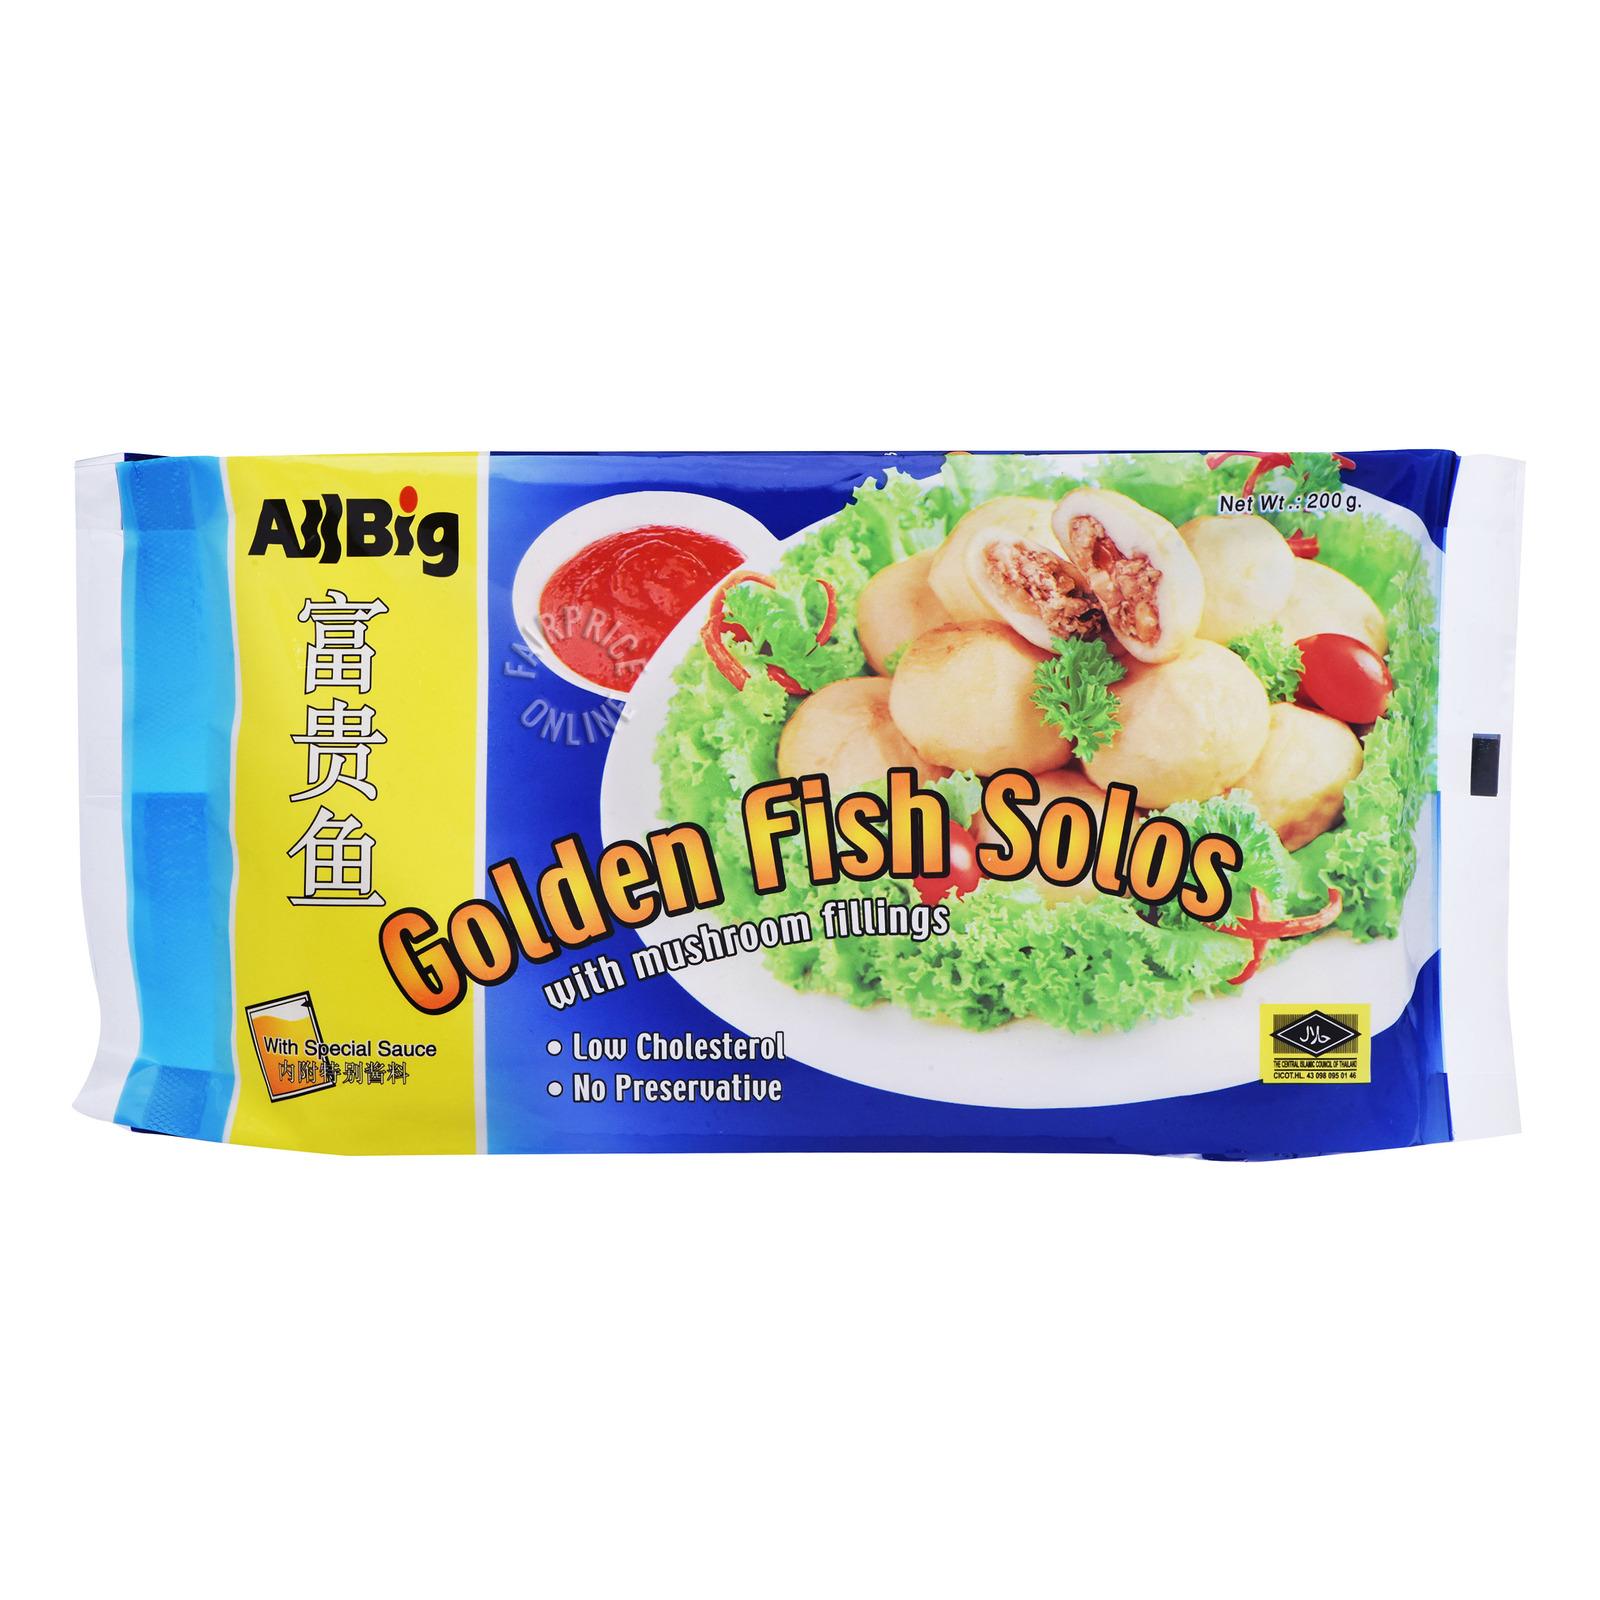 All Big Frozen Golden Fish Solos with Mushroom Fillings